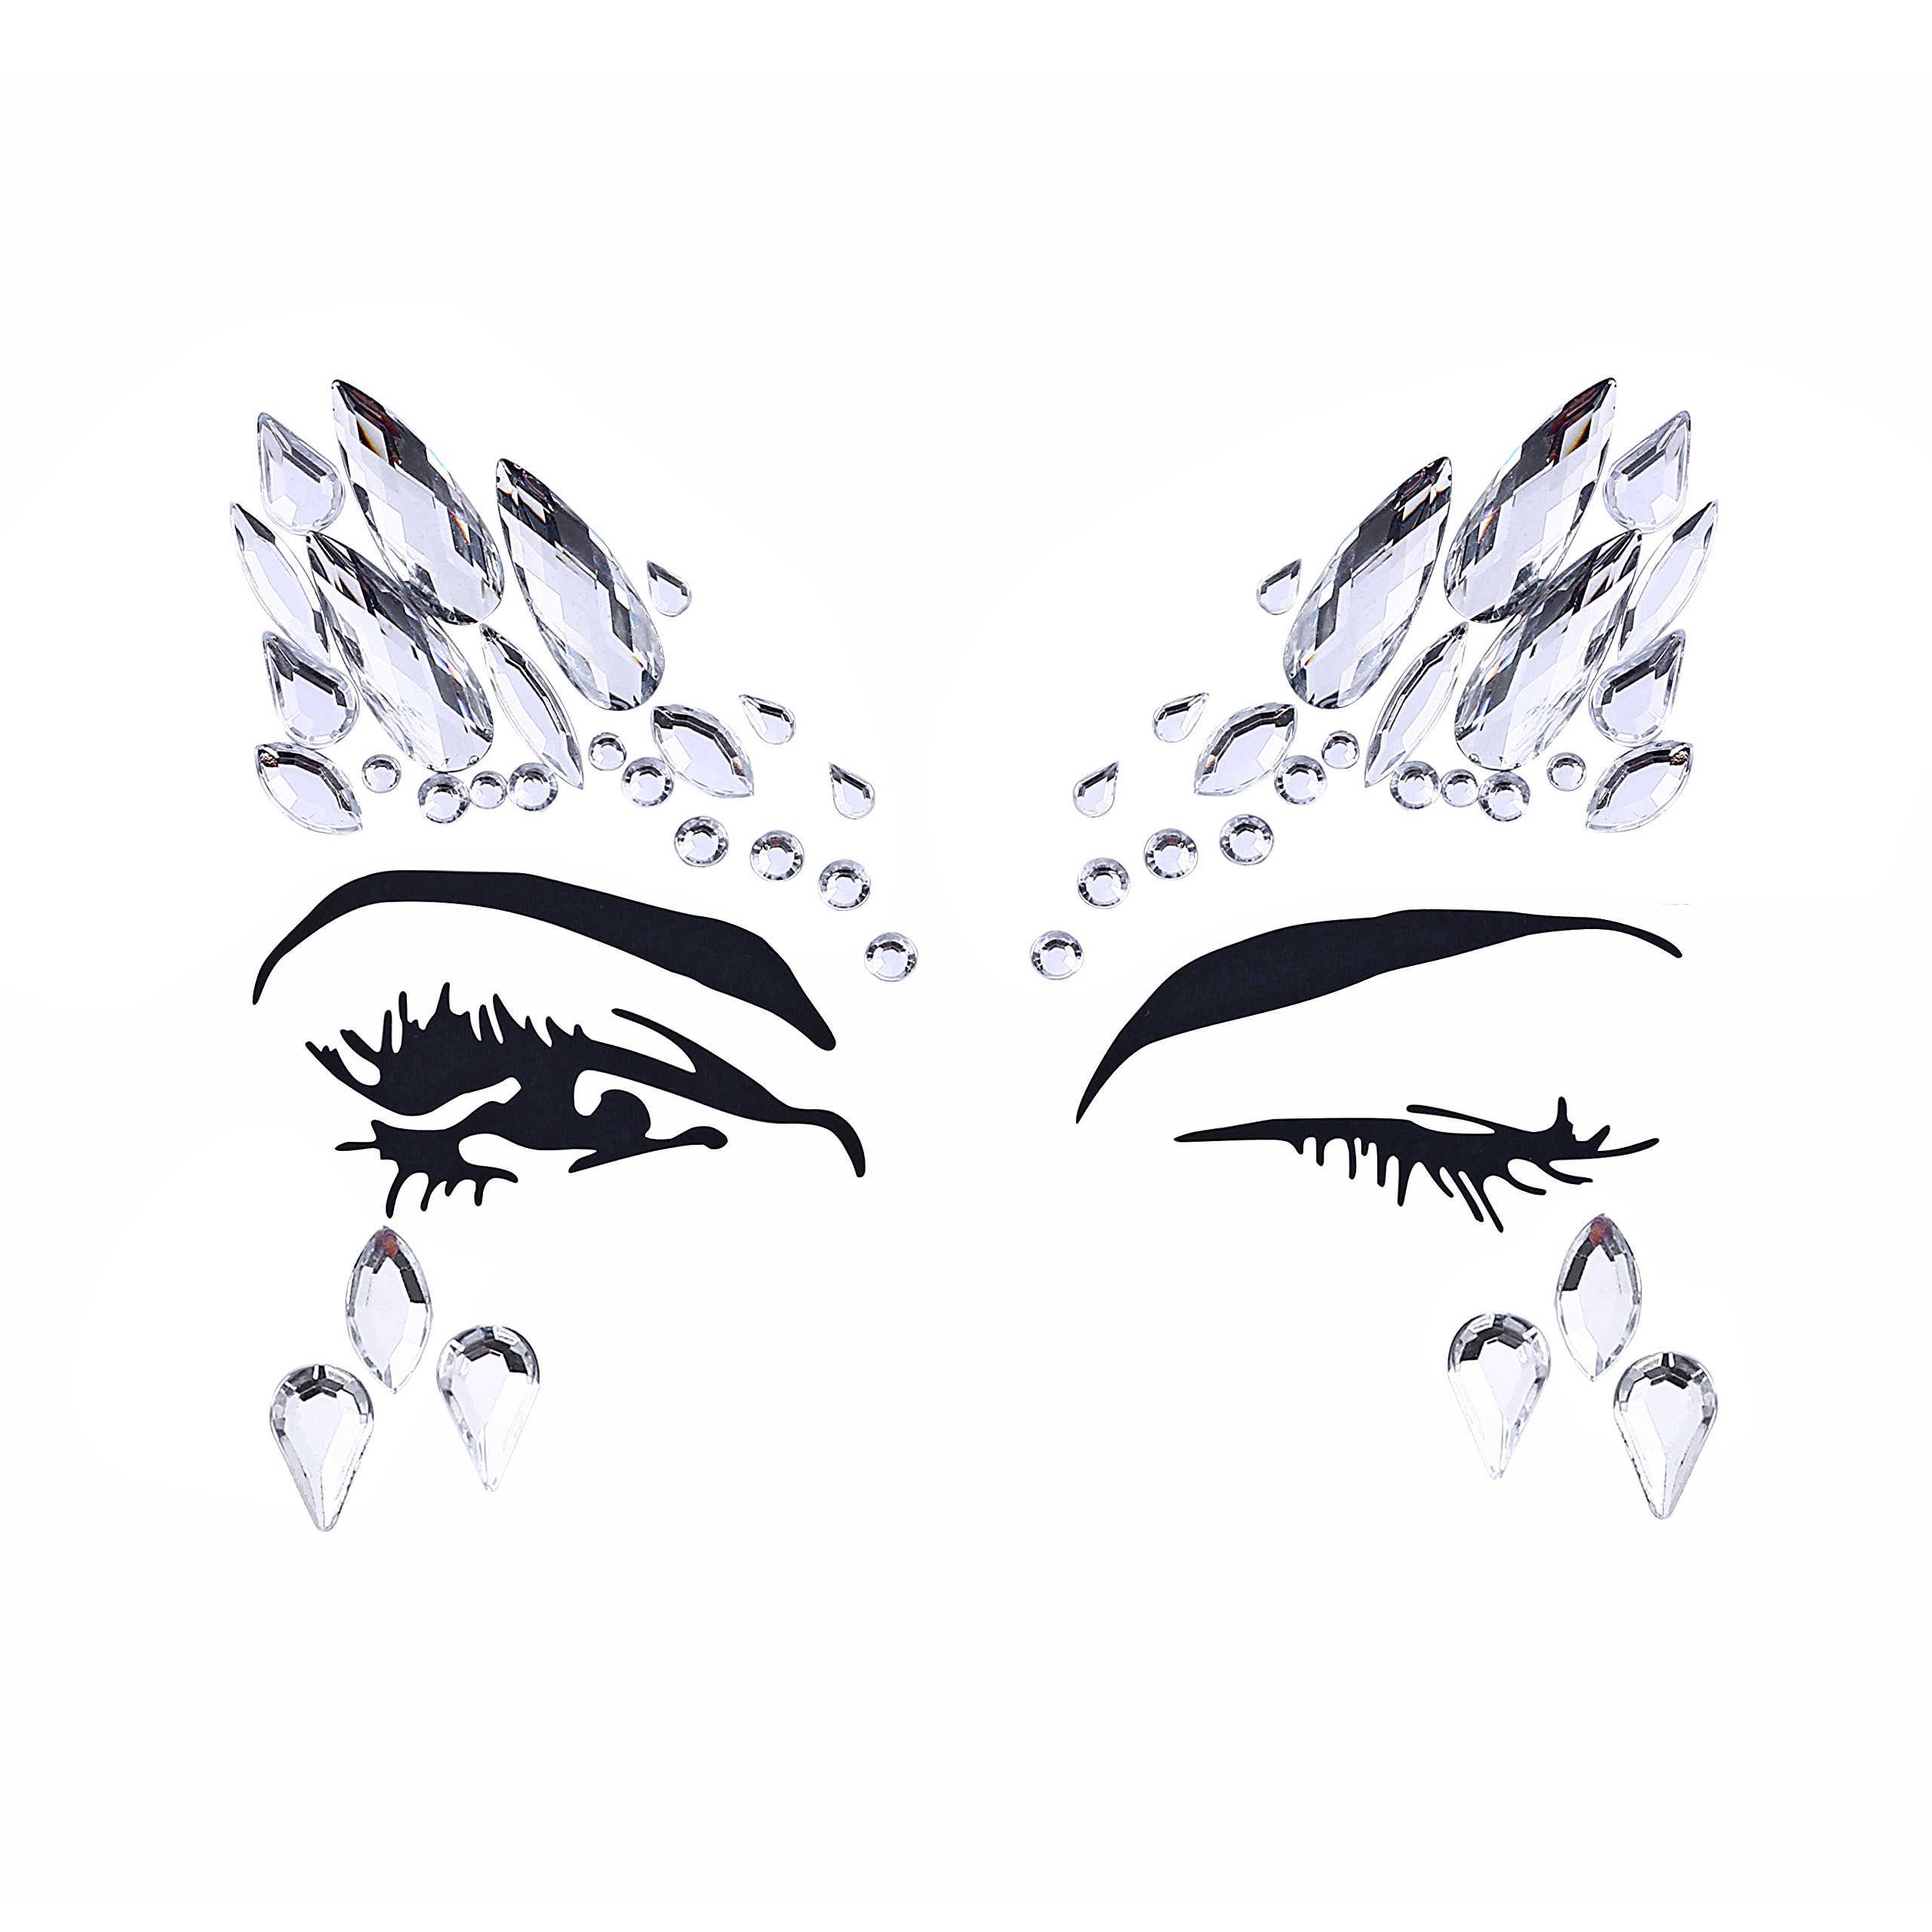 8 Sets Women Gems Glitter Rhinestone Mermaid Face Jewels Tattoo Crystal Tears Gem Stones Bindi Temporary Stickers by du fangbin (Image #6)